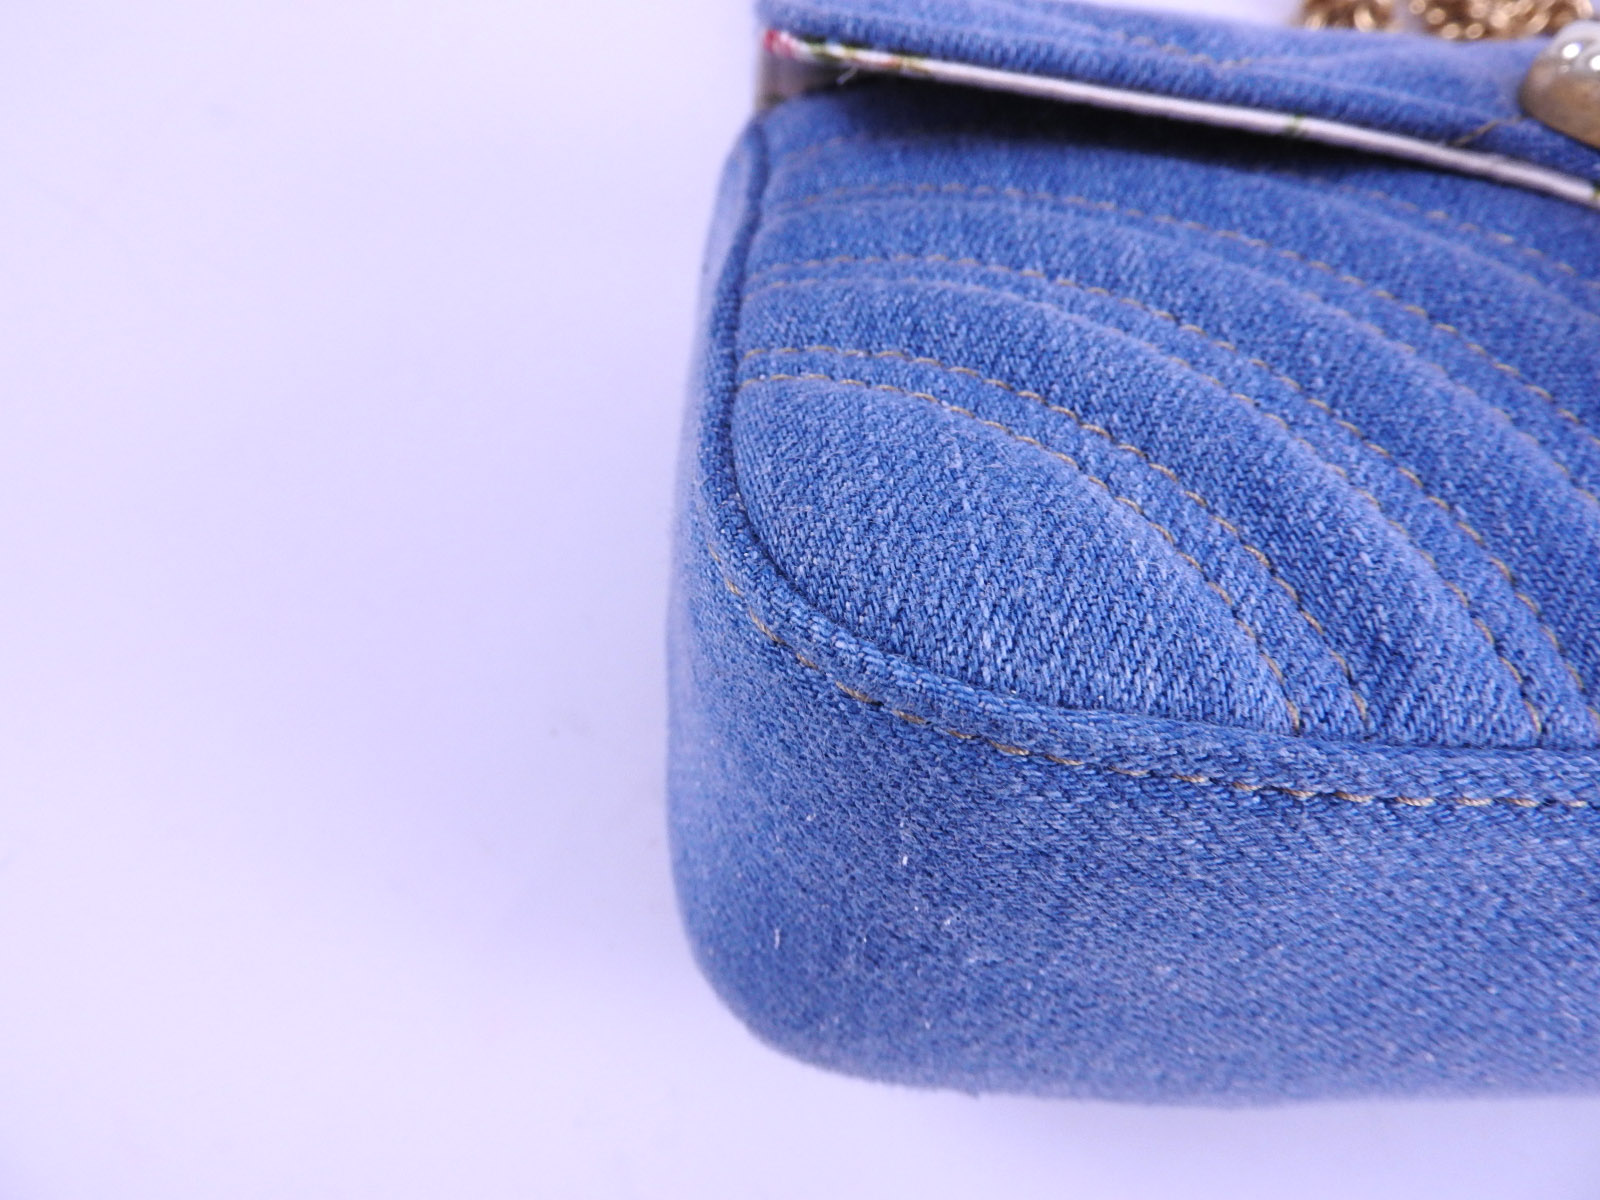 f0258cc90c3 Auth GUCCI GG Marmont Chain Shoulder Bag Blue Chevron Quilting Denim ...